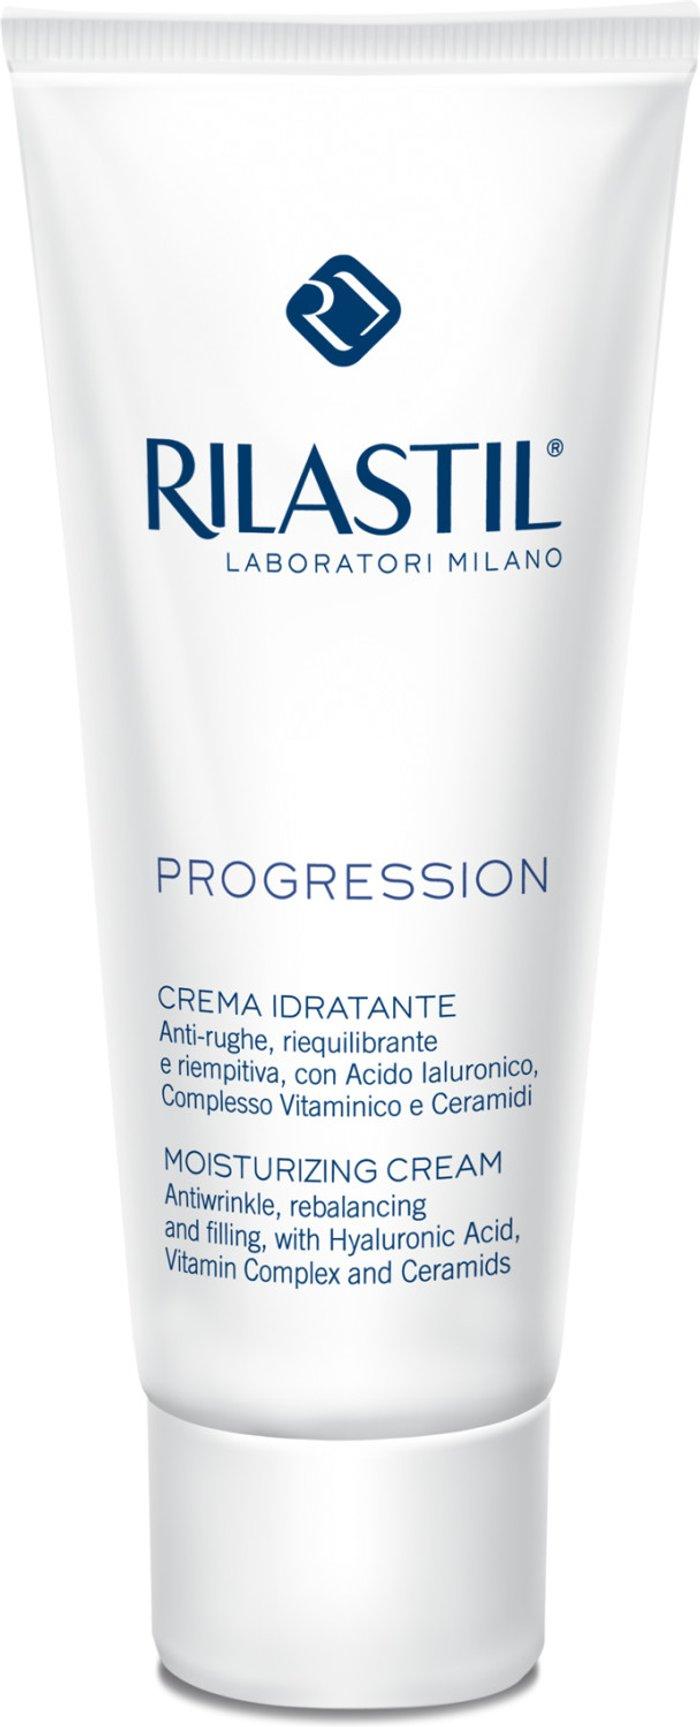 Rilastil Rilastil Progression Moisturizing Cream (50ml)